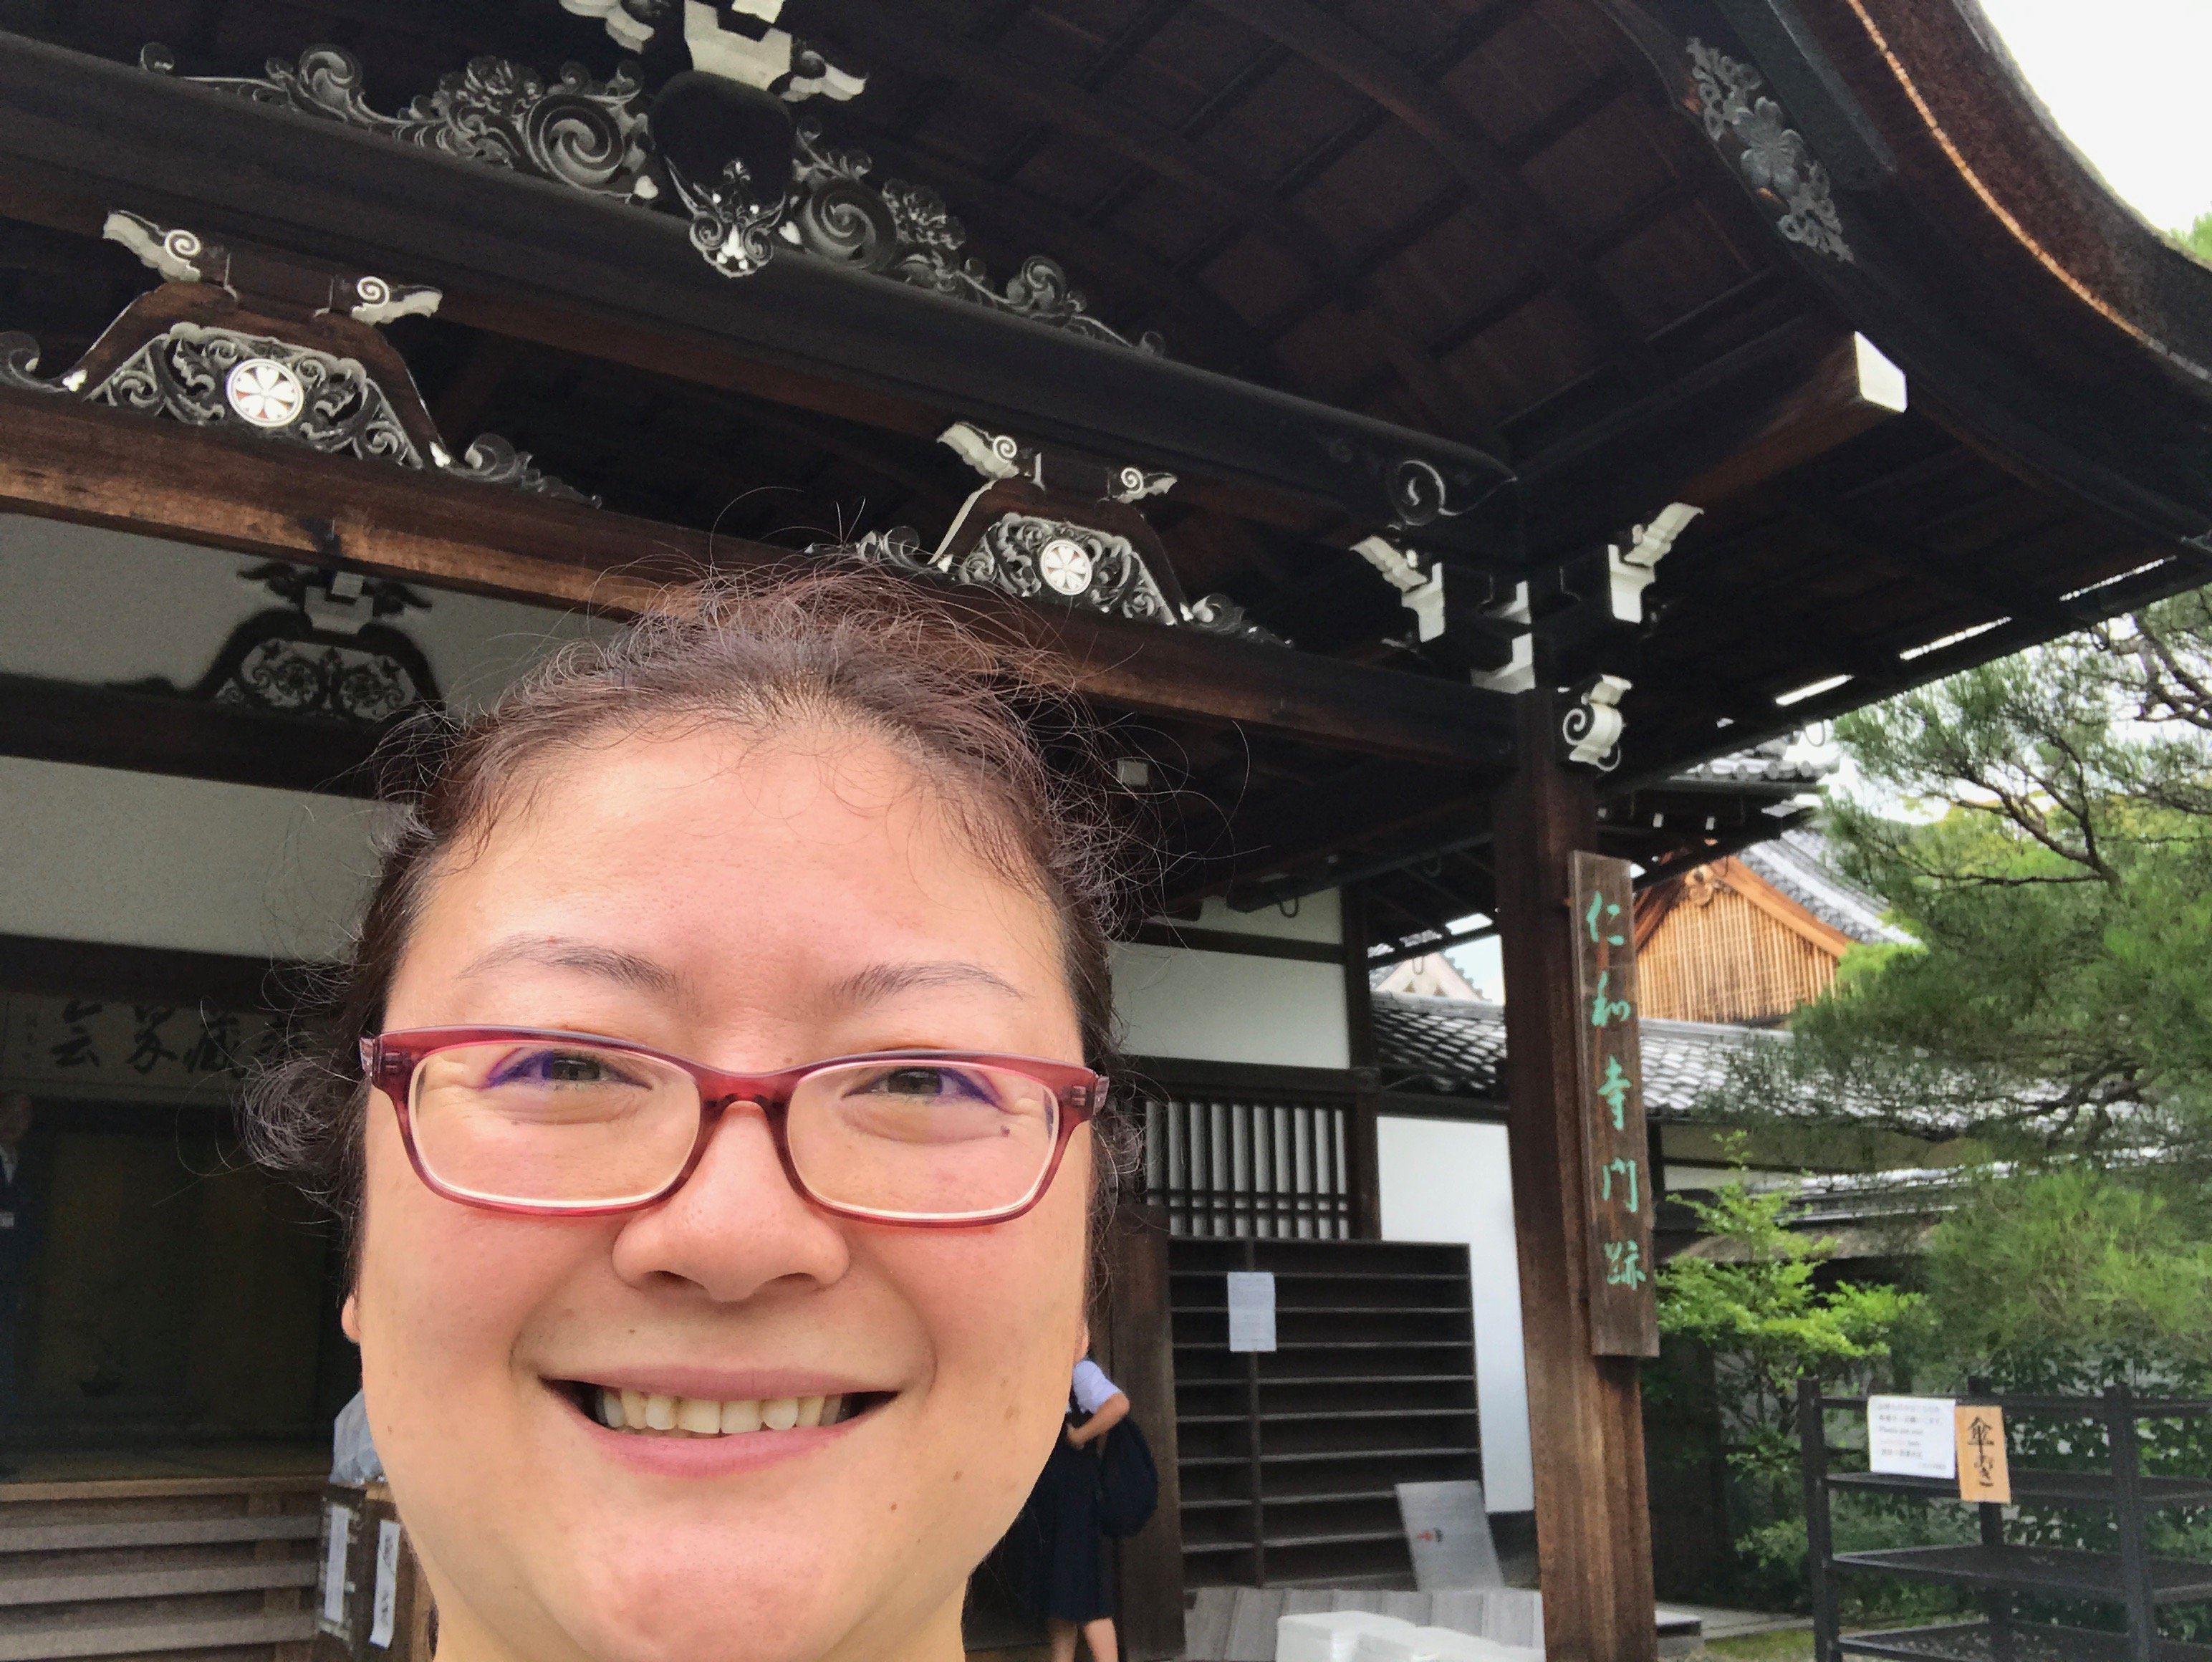 What To Do In Japan - Ninna-ji Temple, Kyoto, Kanagawa, Japan